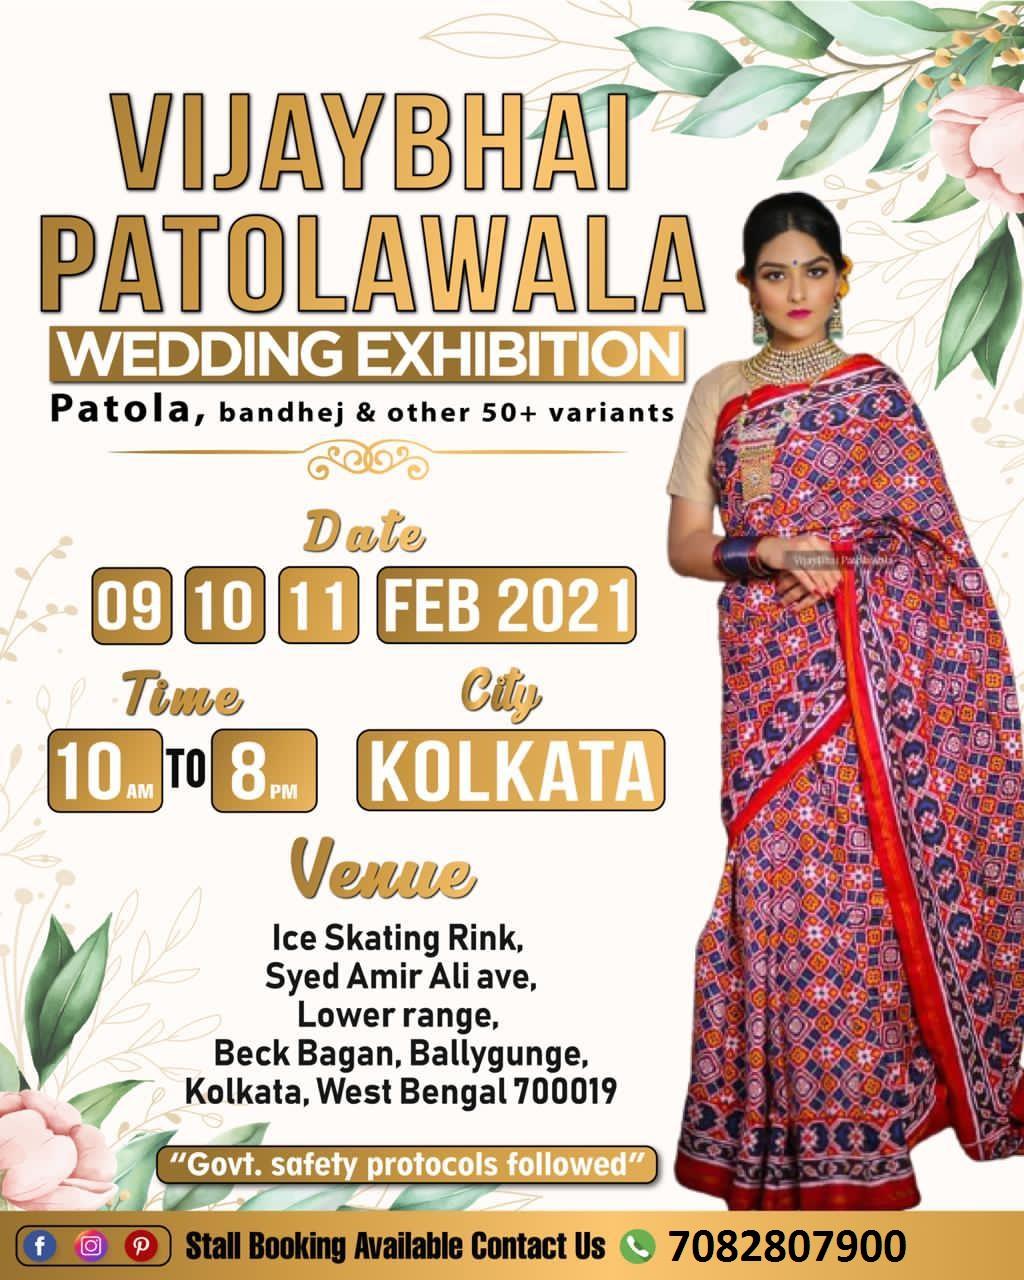 Patolawala Wedding Exhibition